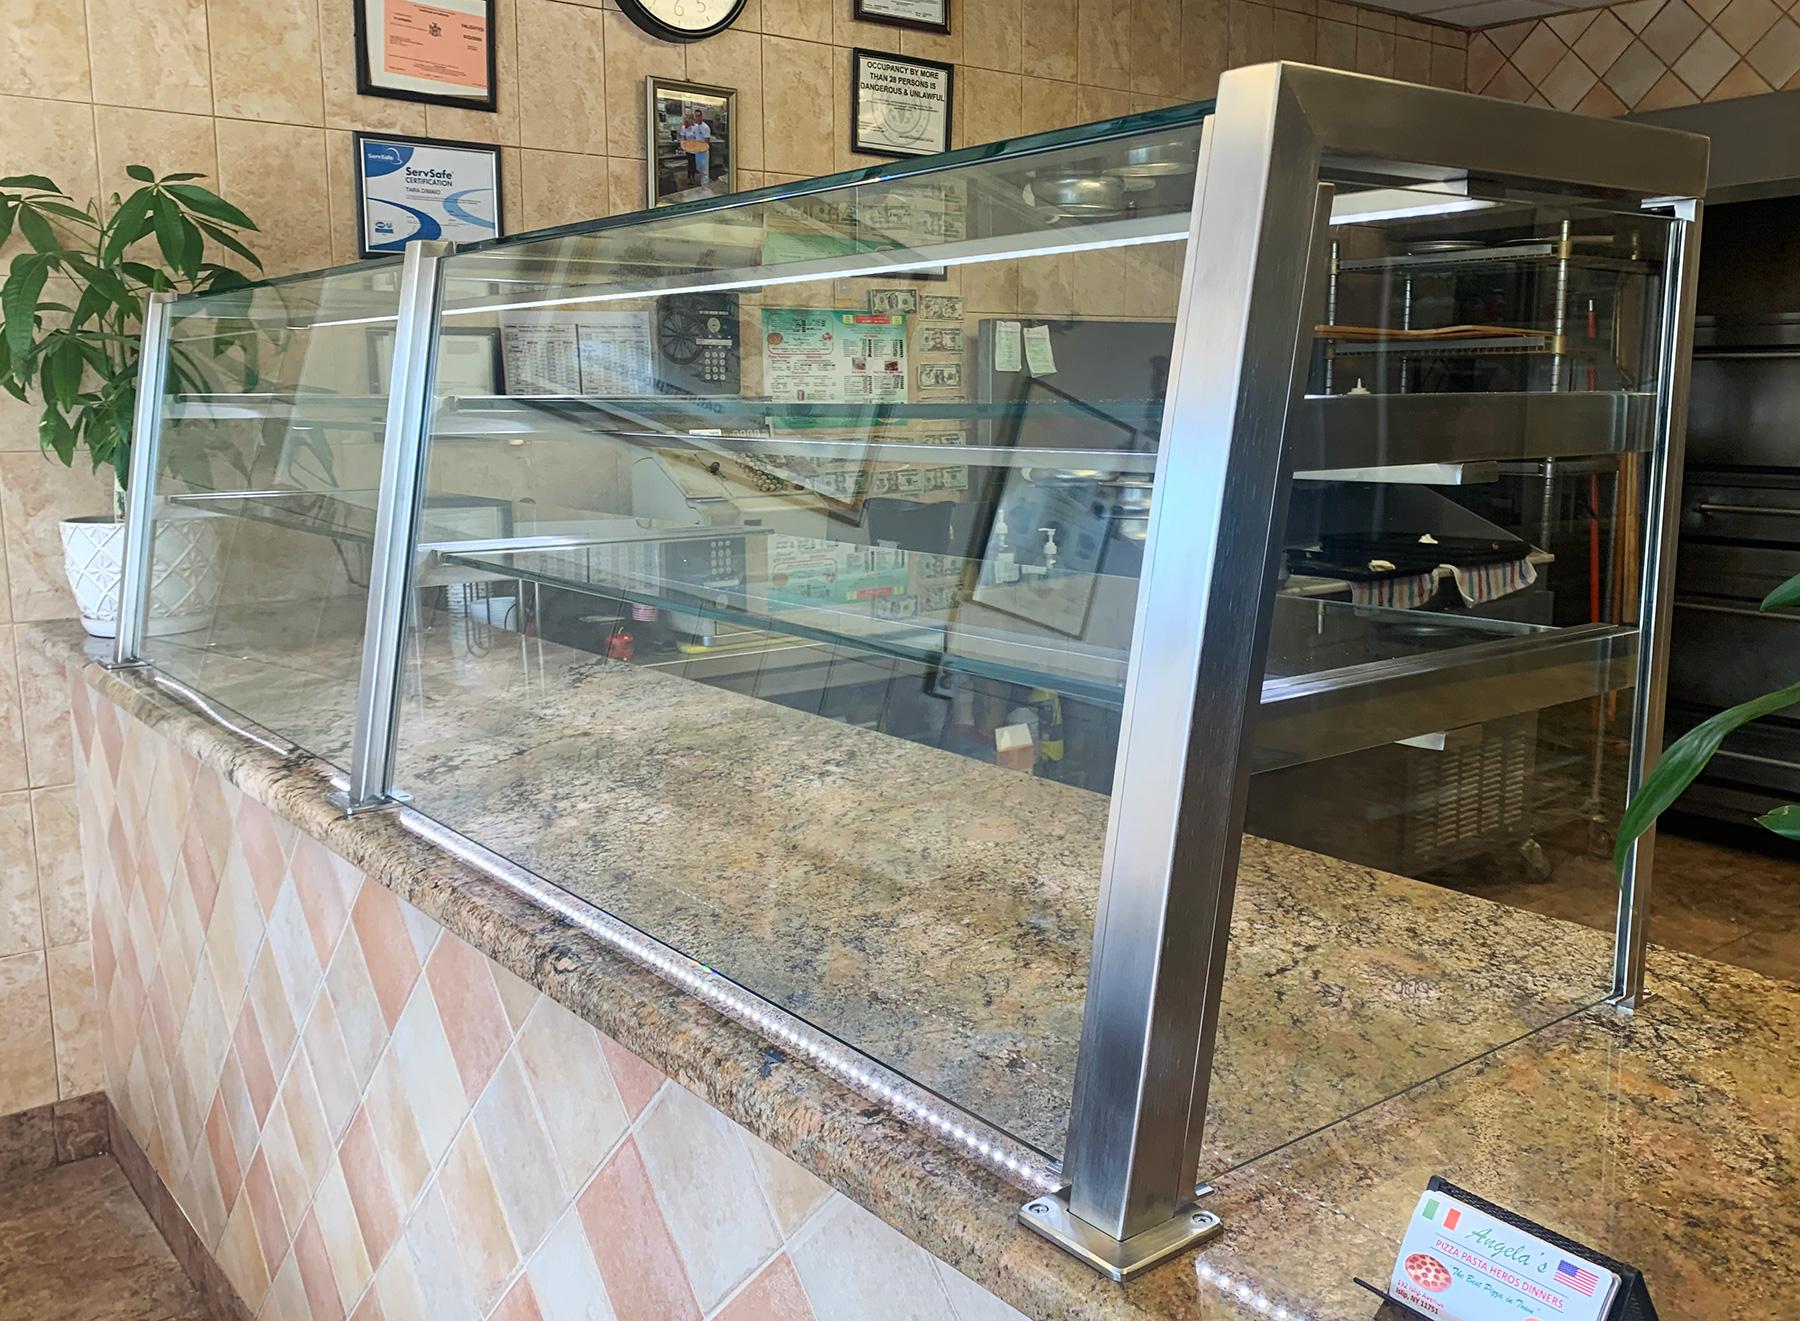 Satin Stainless Steel Food Shield | Angela's Pizza, Islip, NY